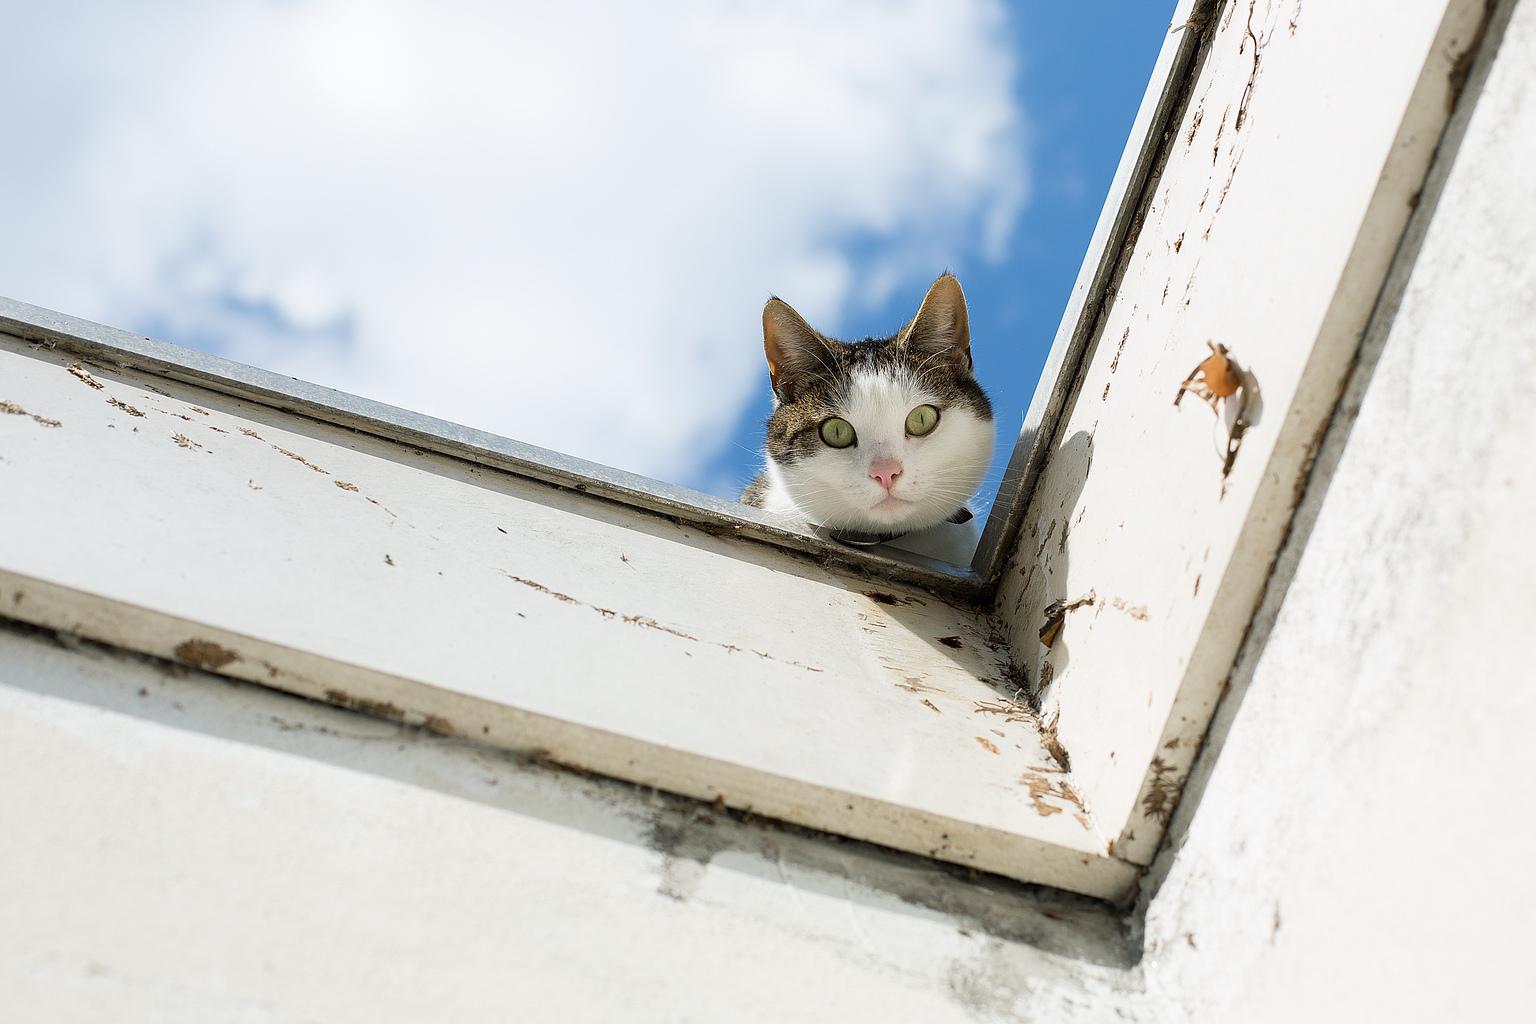 kiekeboe - Zomaar grappig. - foto door annaseb op 16-04-2021 - deze foto bevat: lucht, kat, wolk, gewervelde, venster, hout, zoogdier, felidae, carnivoor, gebouw